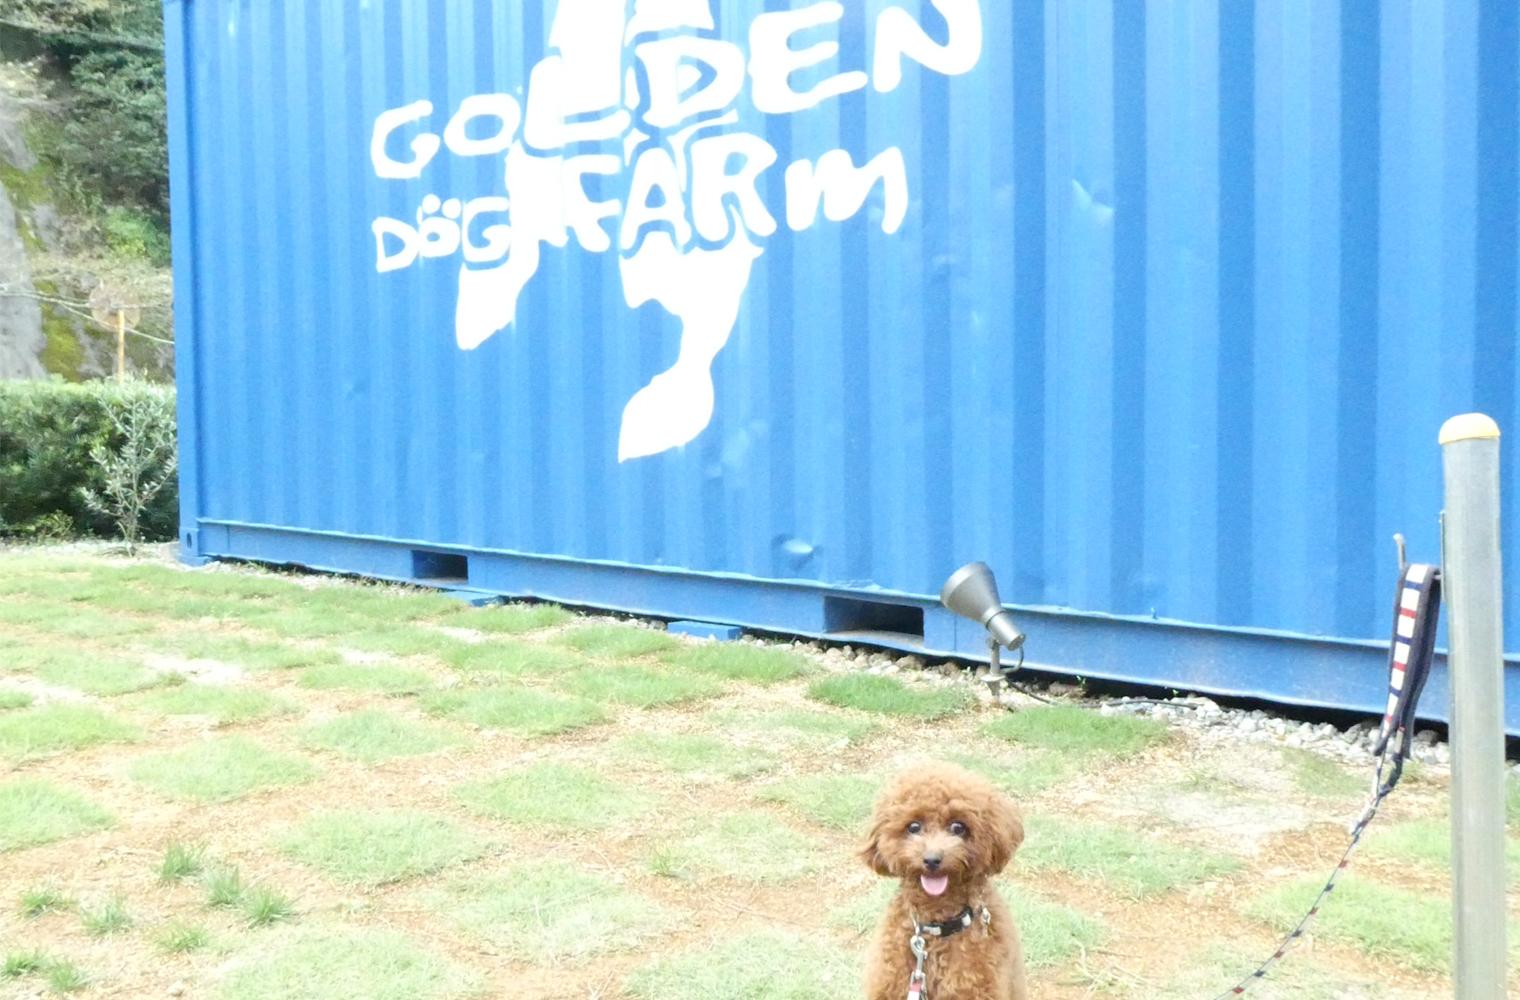 GOLDEN DOG FARm(ゴールデンドッグファーム)-静岡市葵区水見色